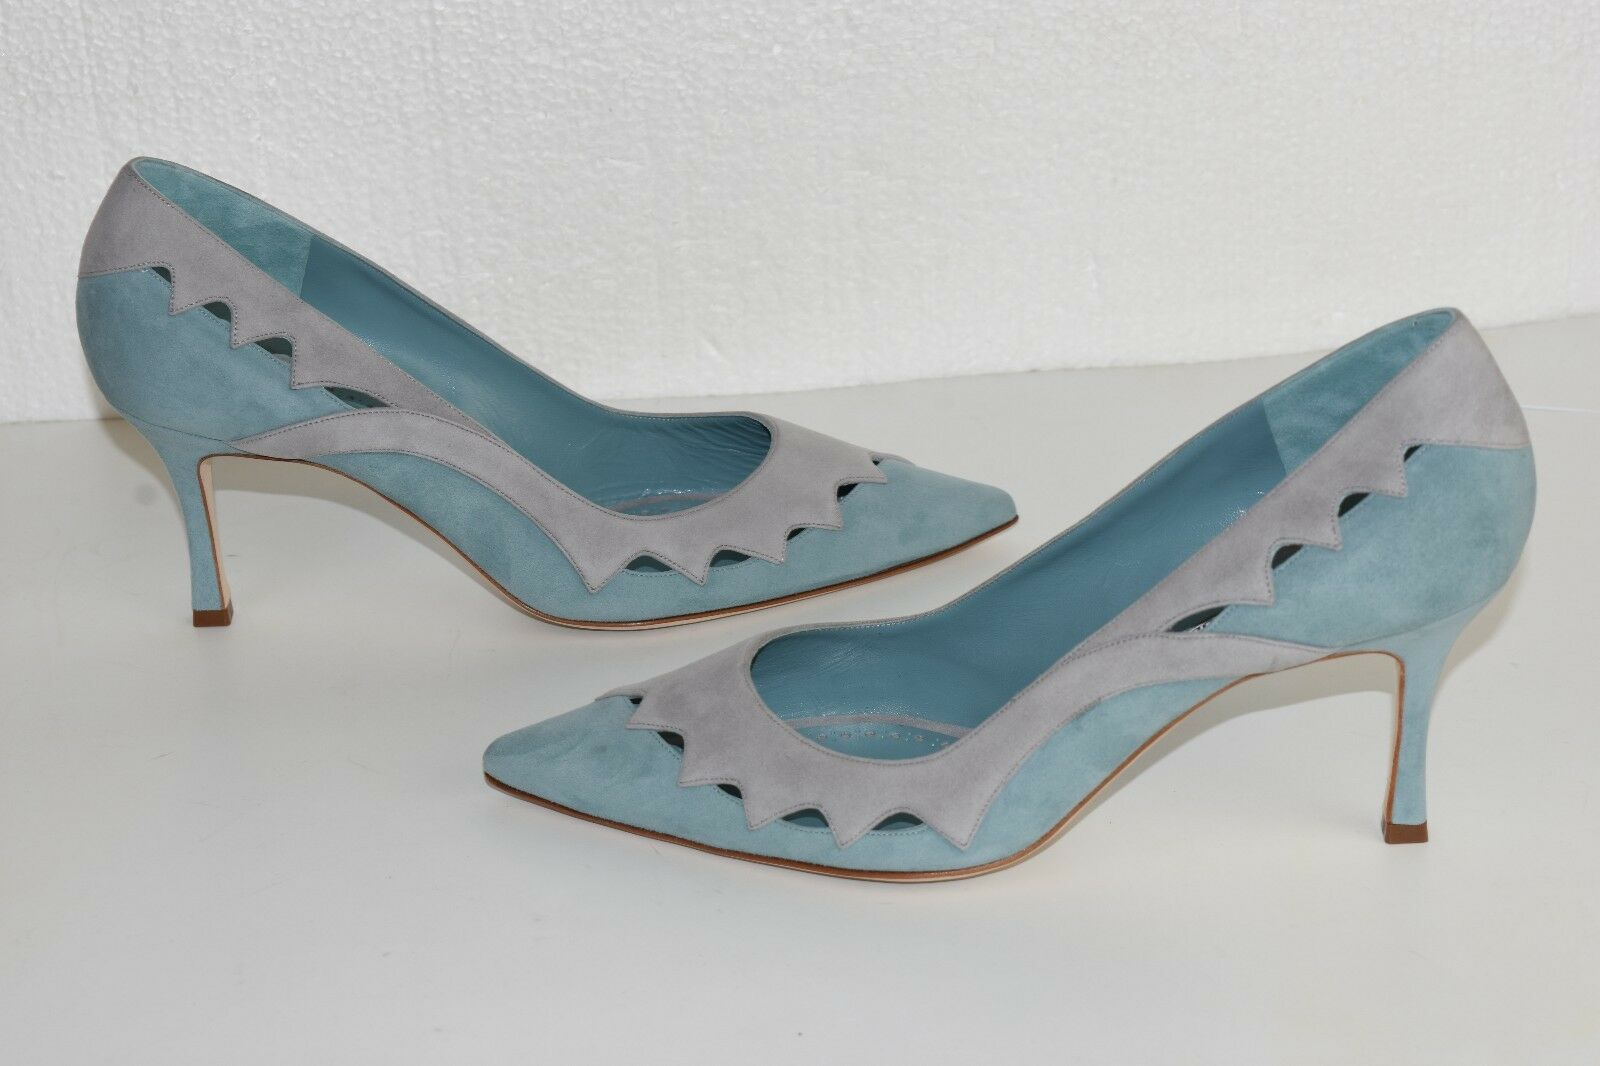 NEW Manolo Blahnik BB Pumps Suede Cut Outs Blue Grey Heels Shoes 40.5 41